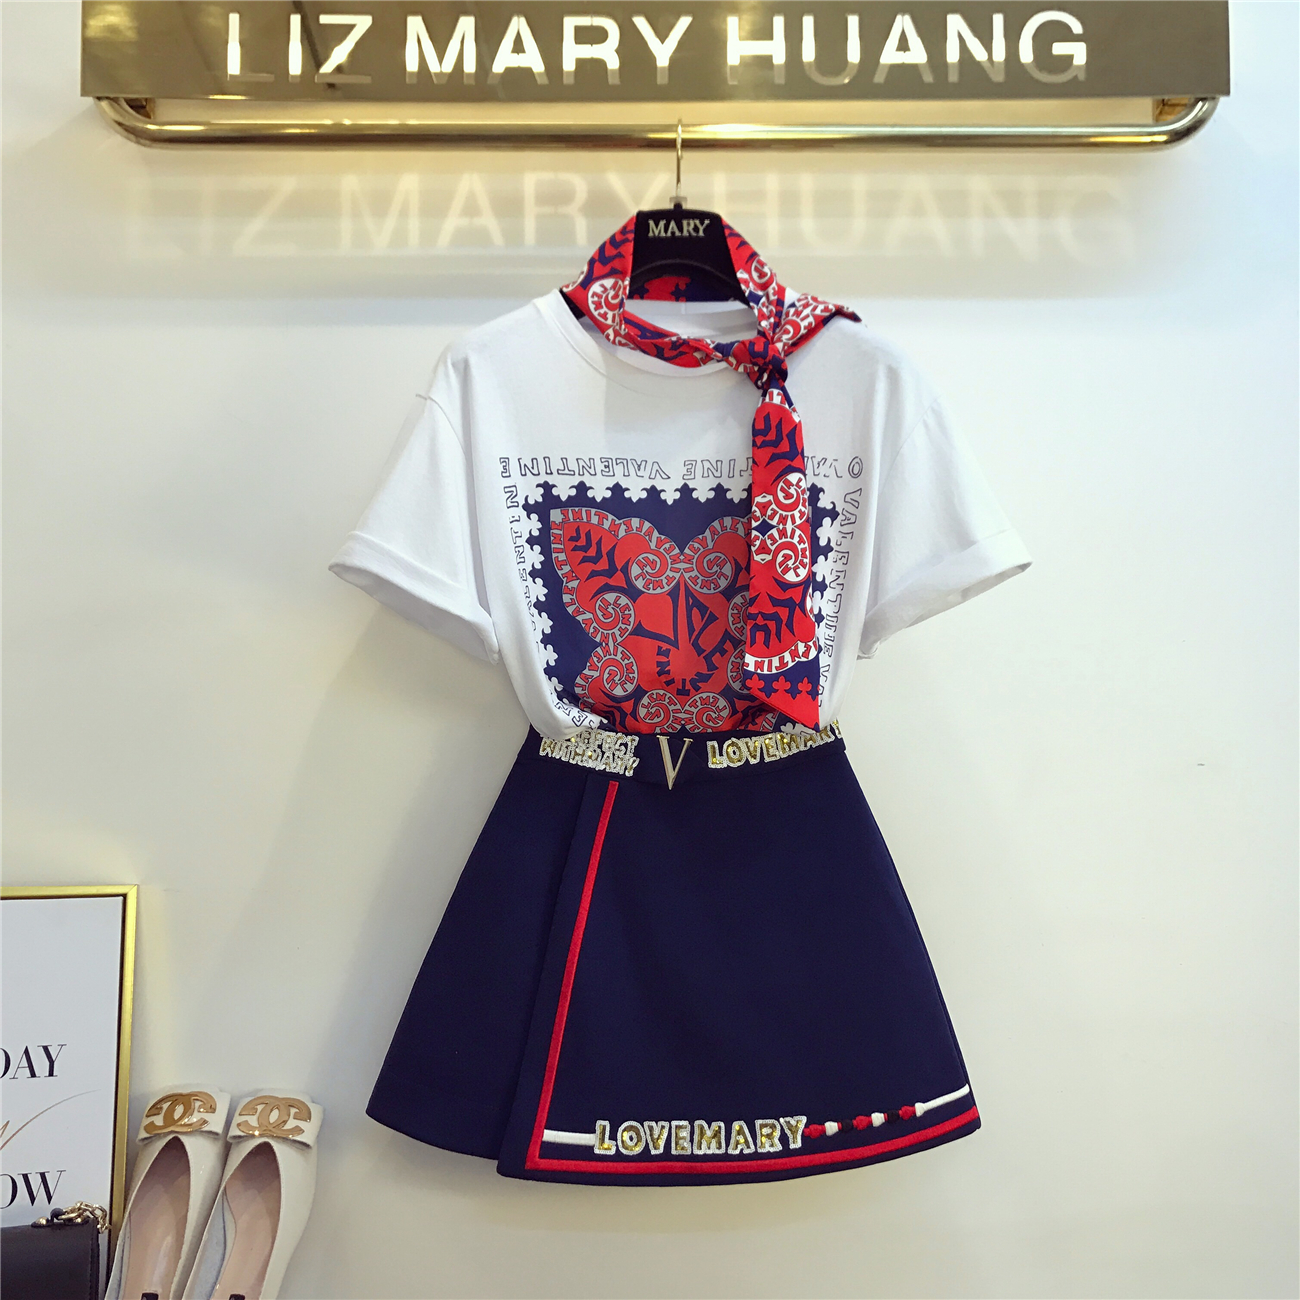 2019 Spring Summer Women 2 Peice Set Fashion Short Sleeve T-shirt + Sequins Letter Mini Skirt Ladies Sexy Skirts Suit Femme Sets Price $39.98